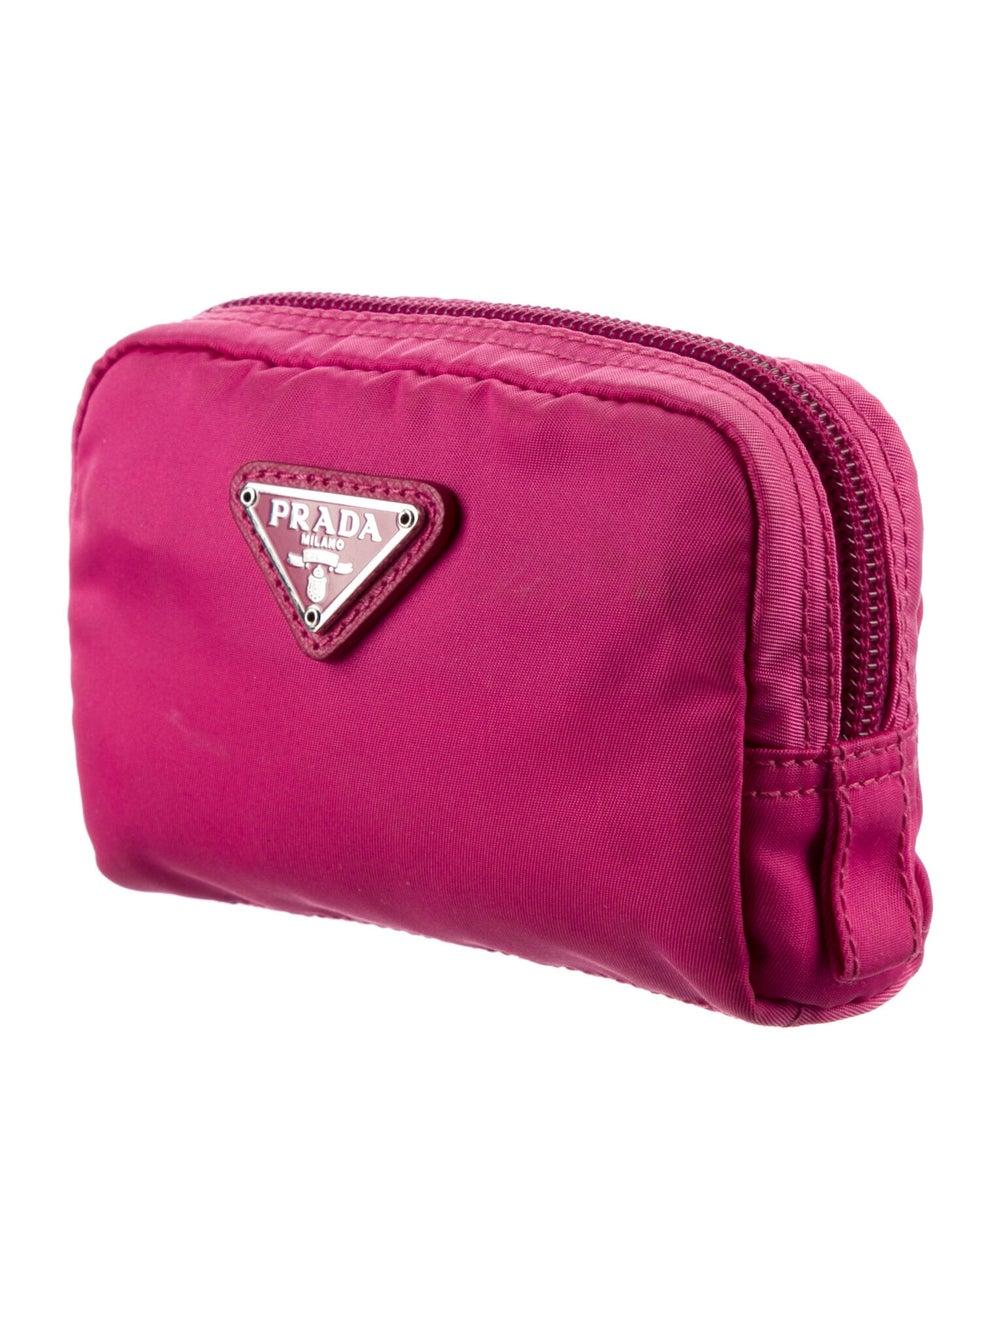 Prada Tessuto Cosmetic Bag Pink - image 3